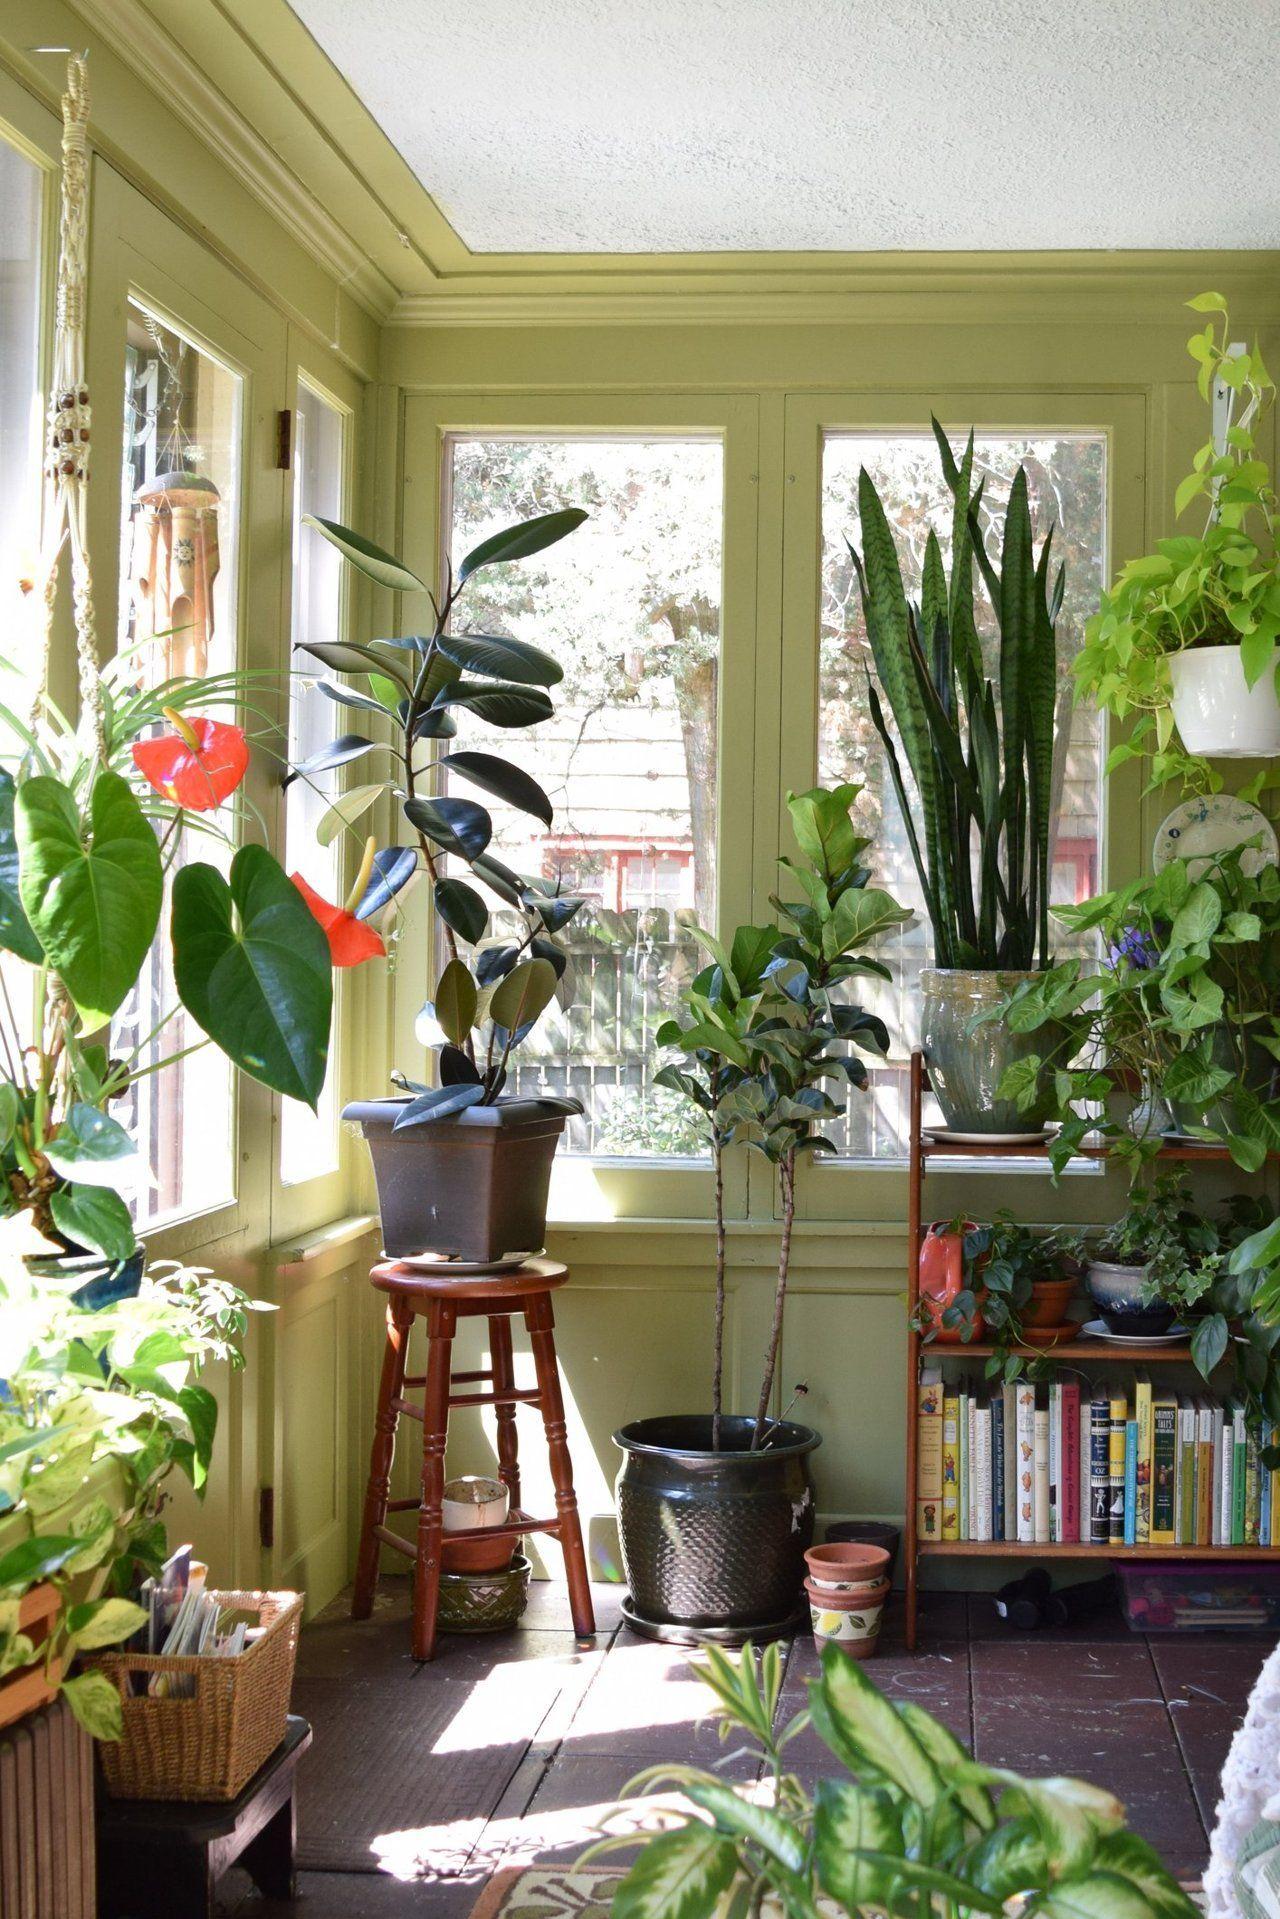 Window ideas for a sunroom  natasha and the plantfilled sunroom  gardening diy gardening tips